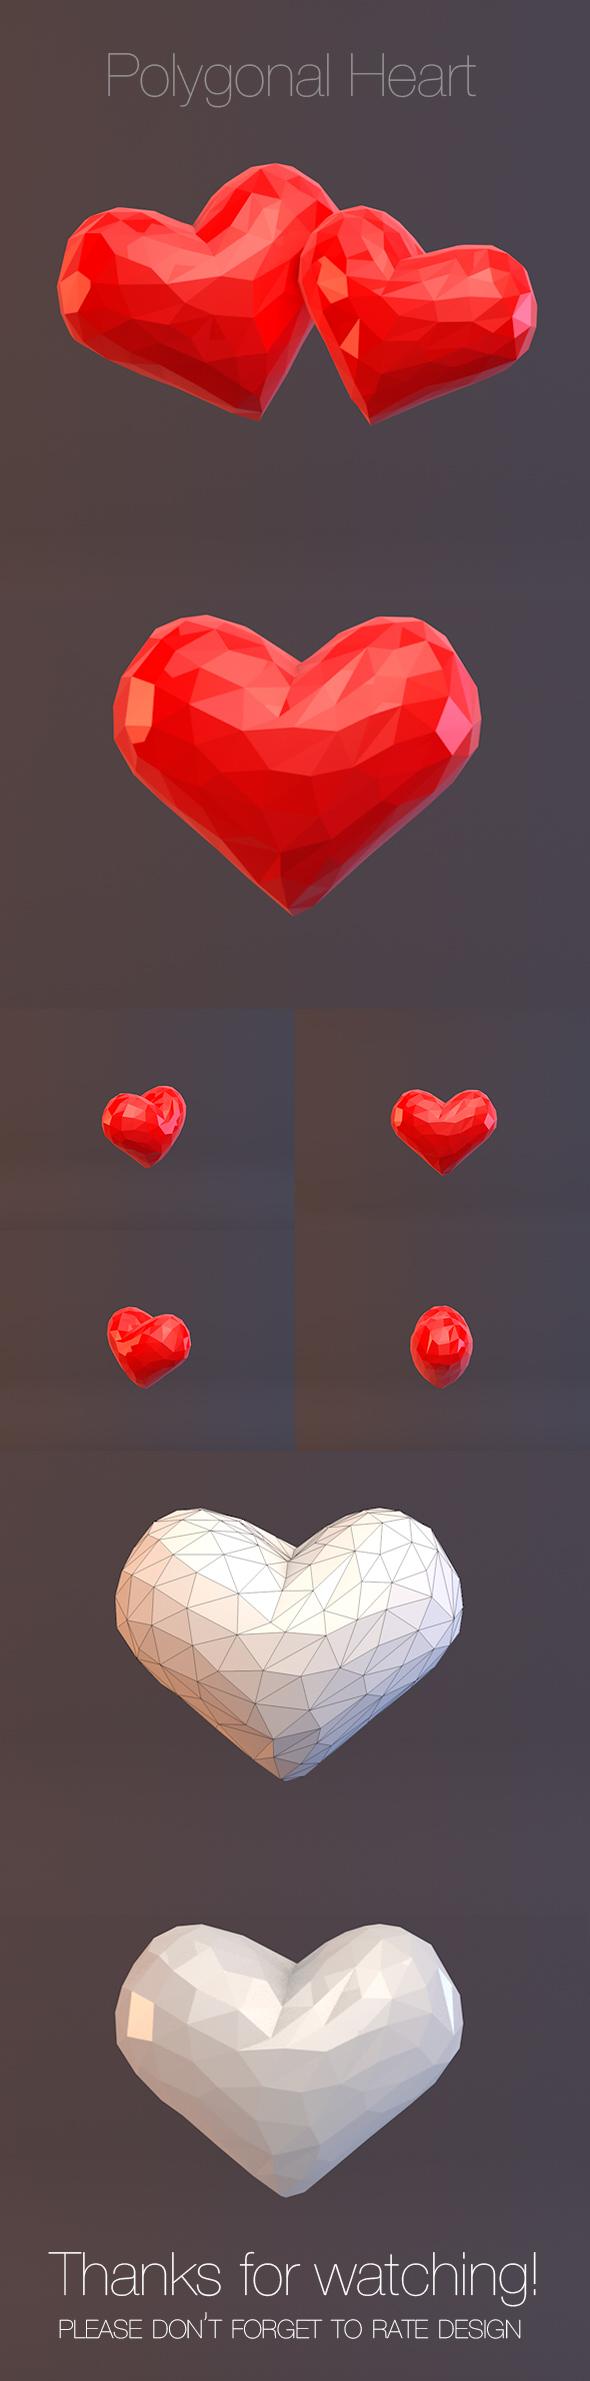 Polygonal Heart - 3DOcean Item for Sale